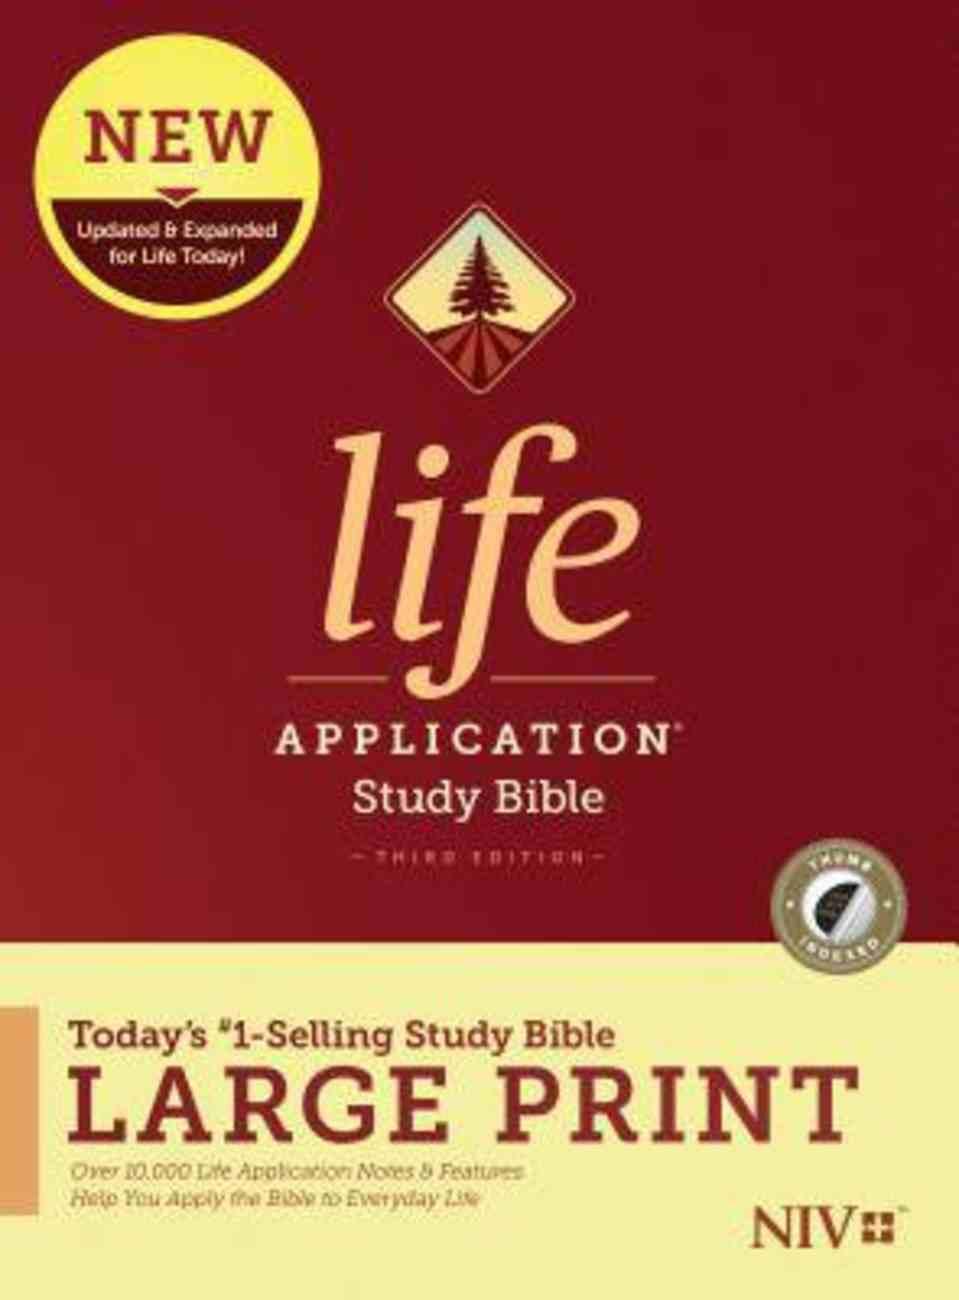 NIV Life Application Study Bible Third Edition Large Print Indexed (Black Letter Edition) Hardback